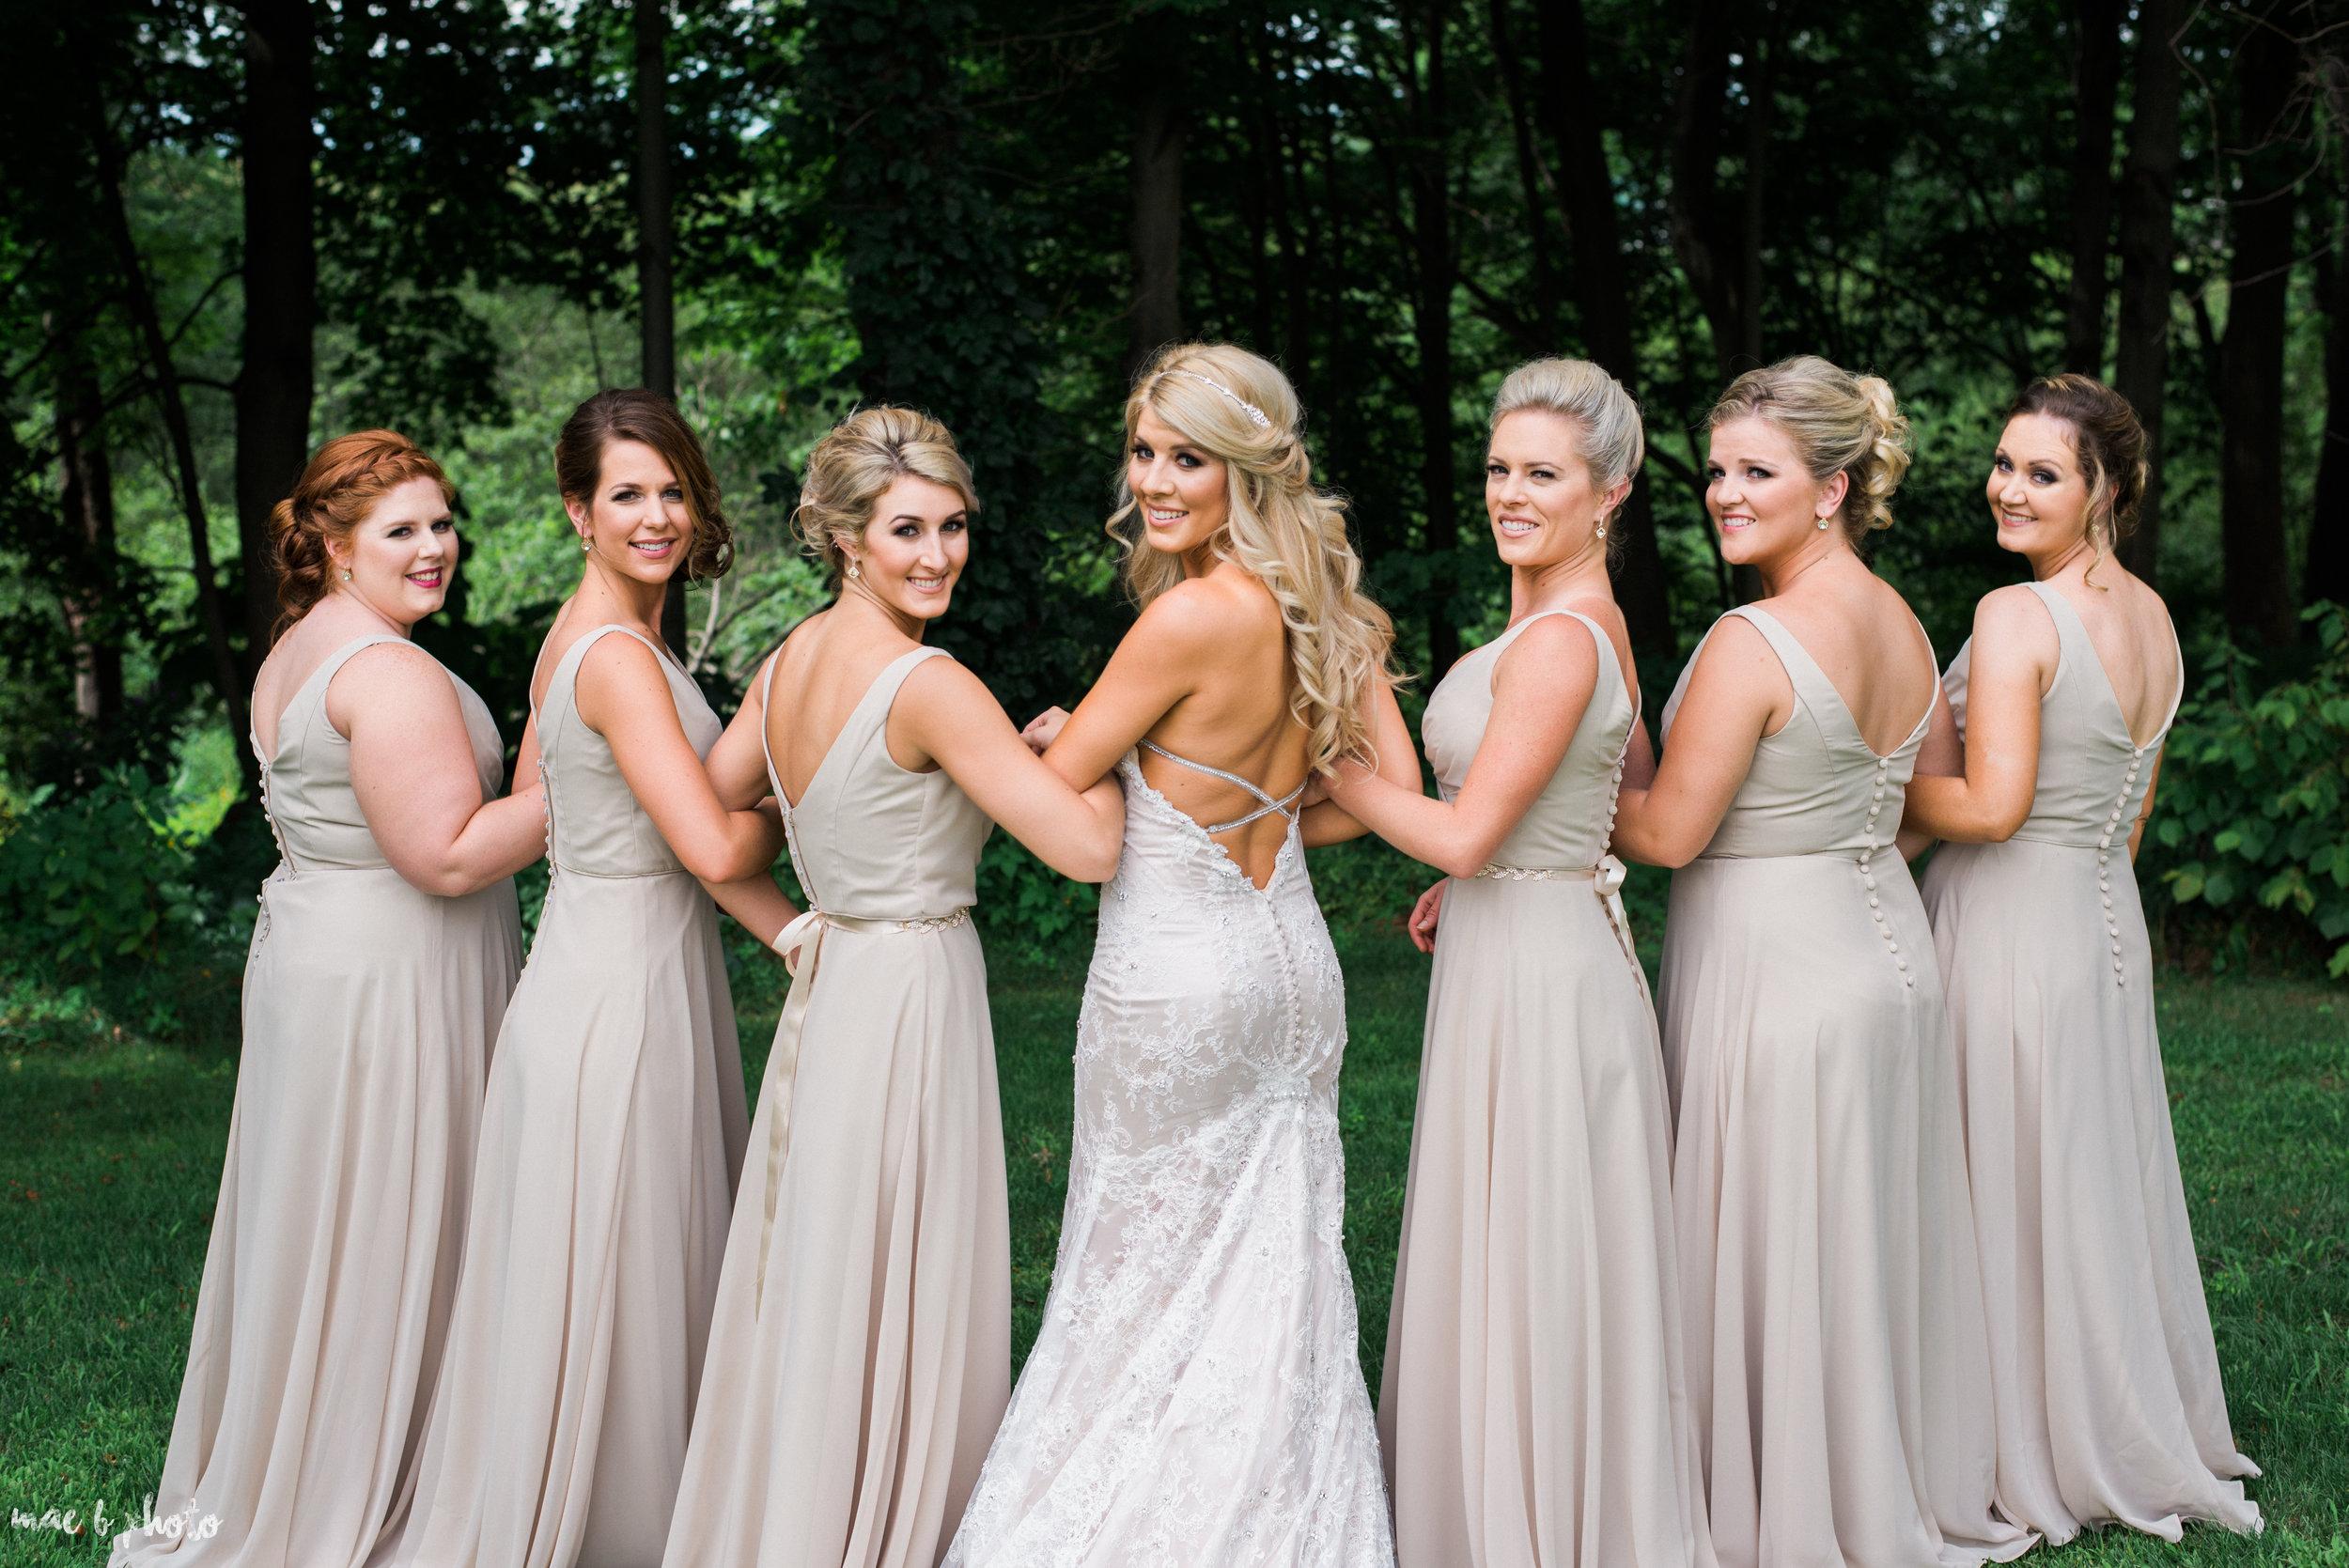 Tara & Matt's Elegant Backyard Summer Wedding in Kinsman, Ohio-53.jpg